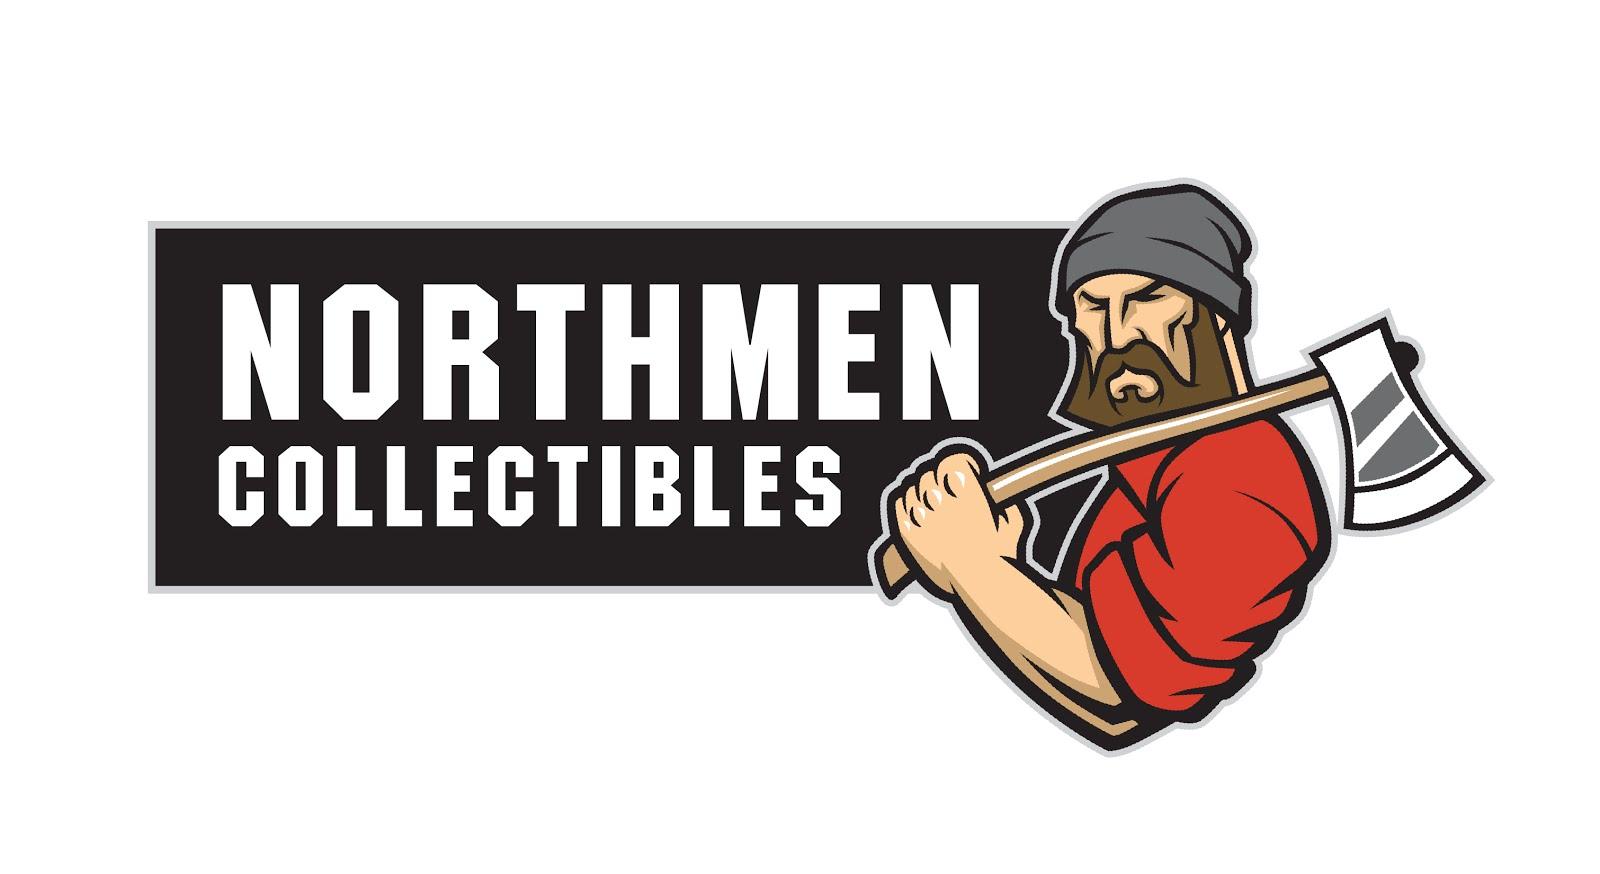 Northmen Collectibles